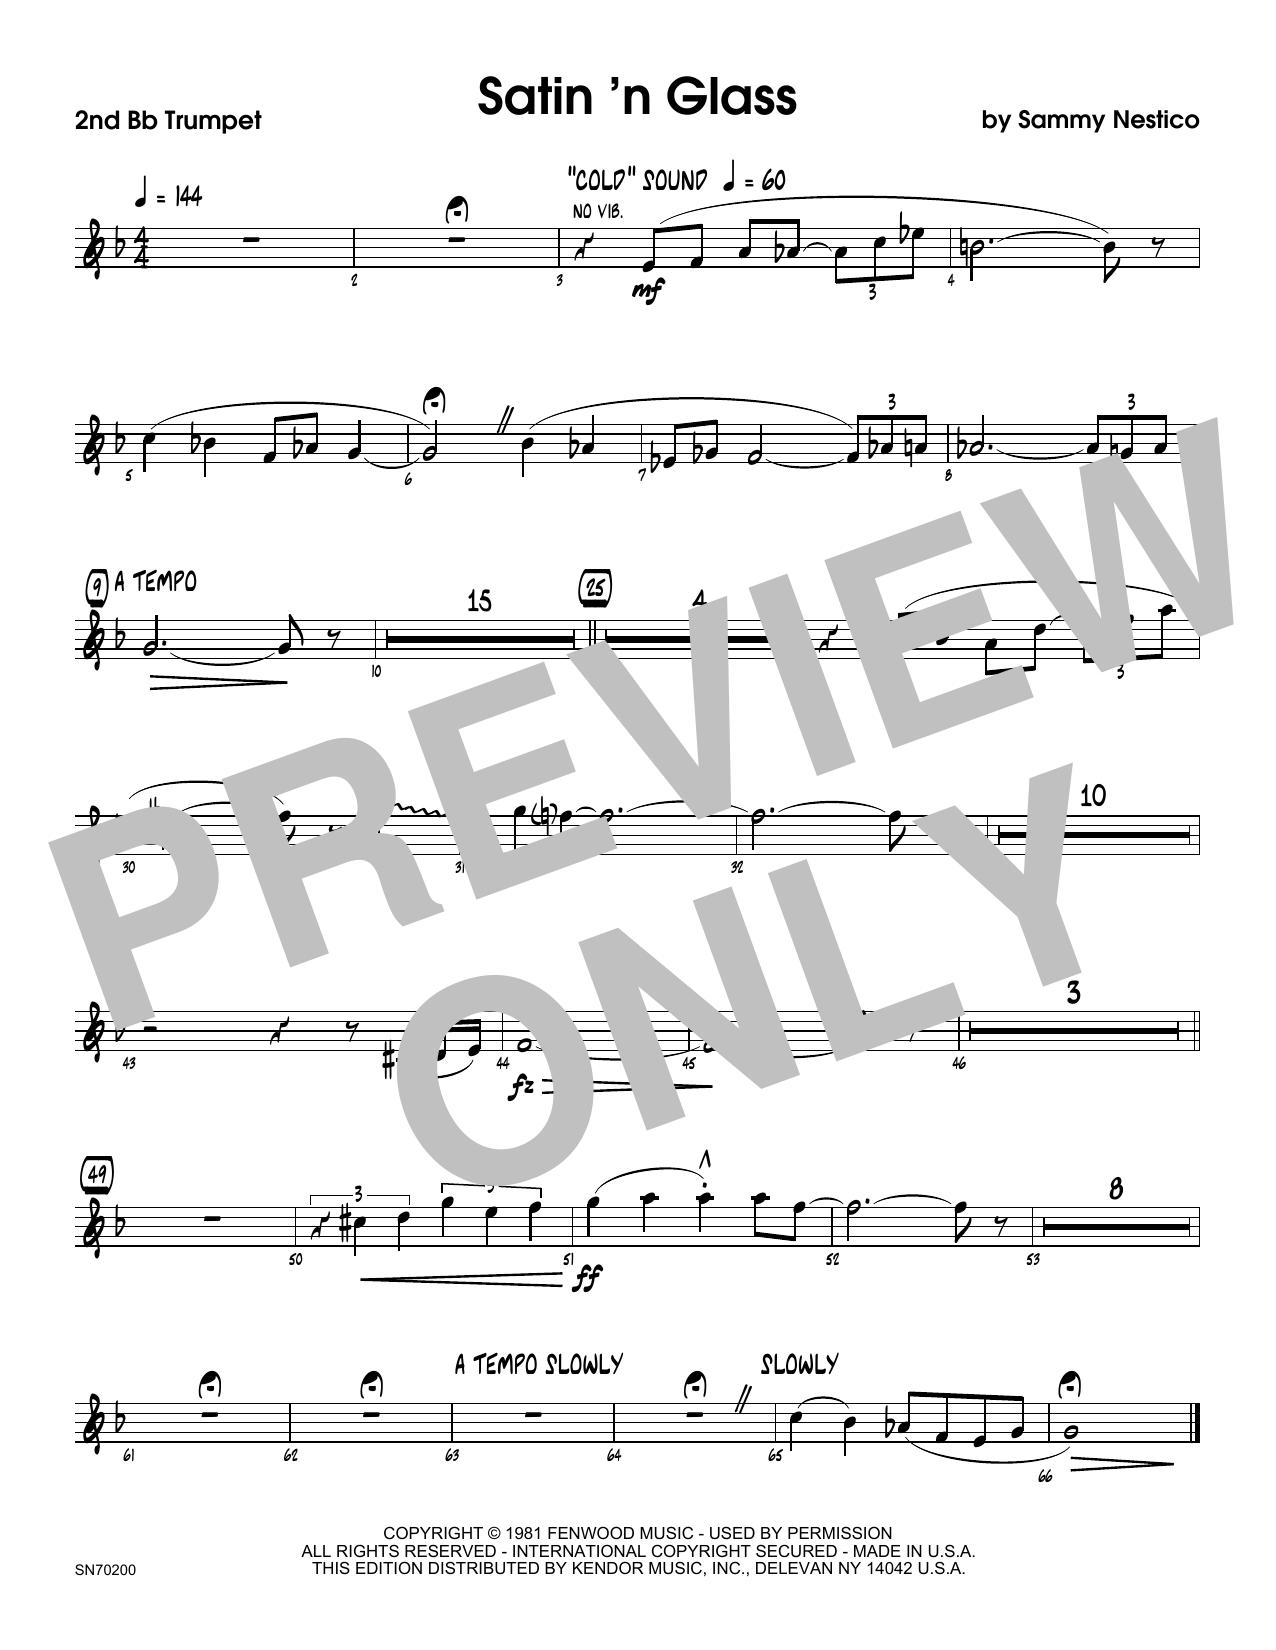 Satin 'n Glass - 2nd Bb Trumpet